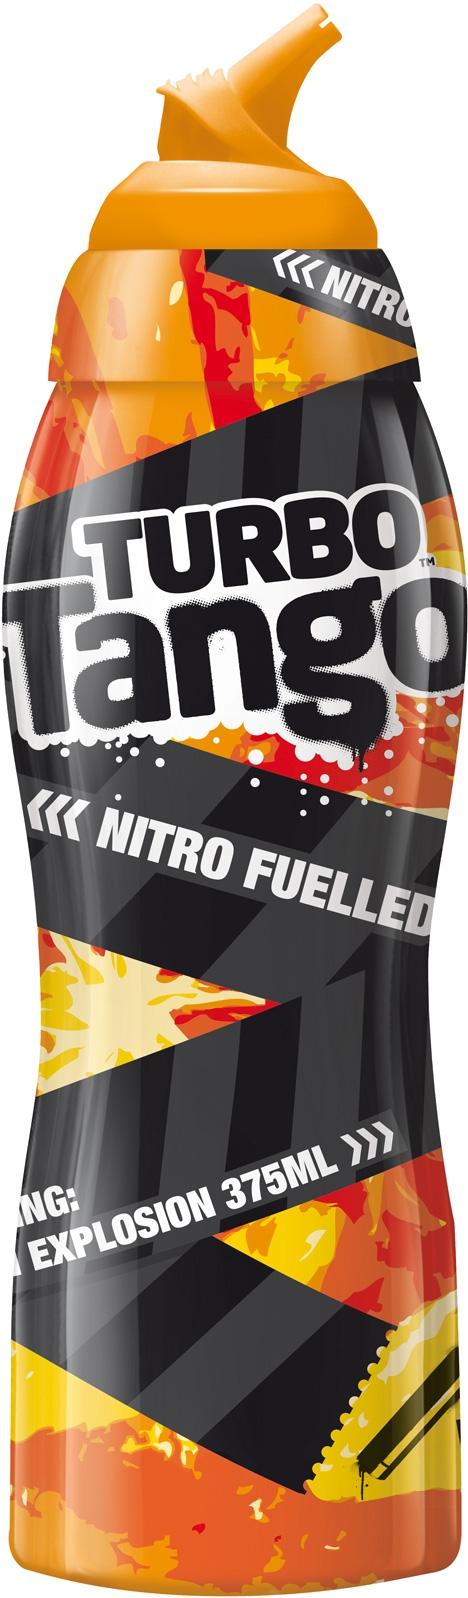 /y/s/i/Tango_Turbo.jpg